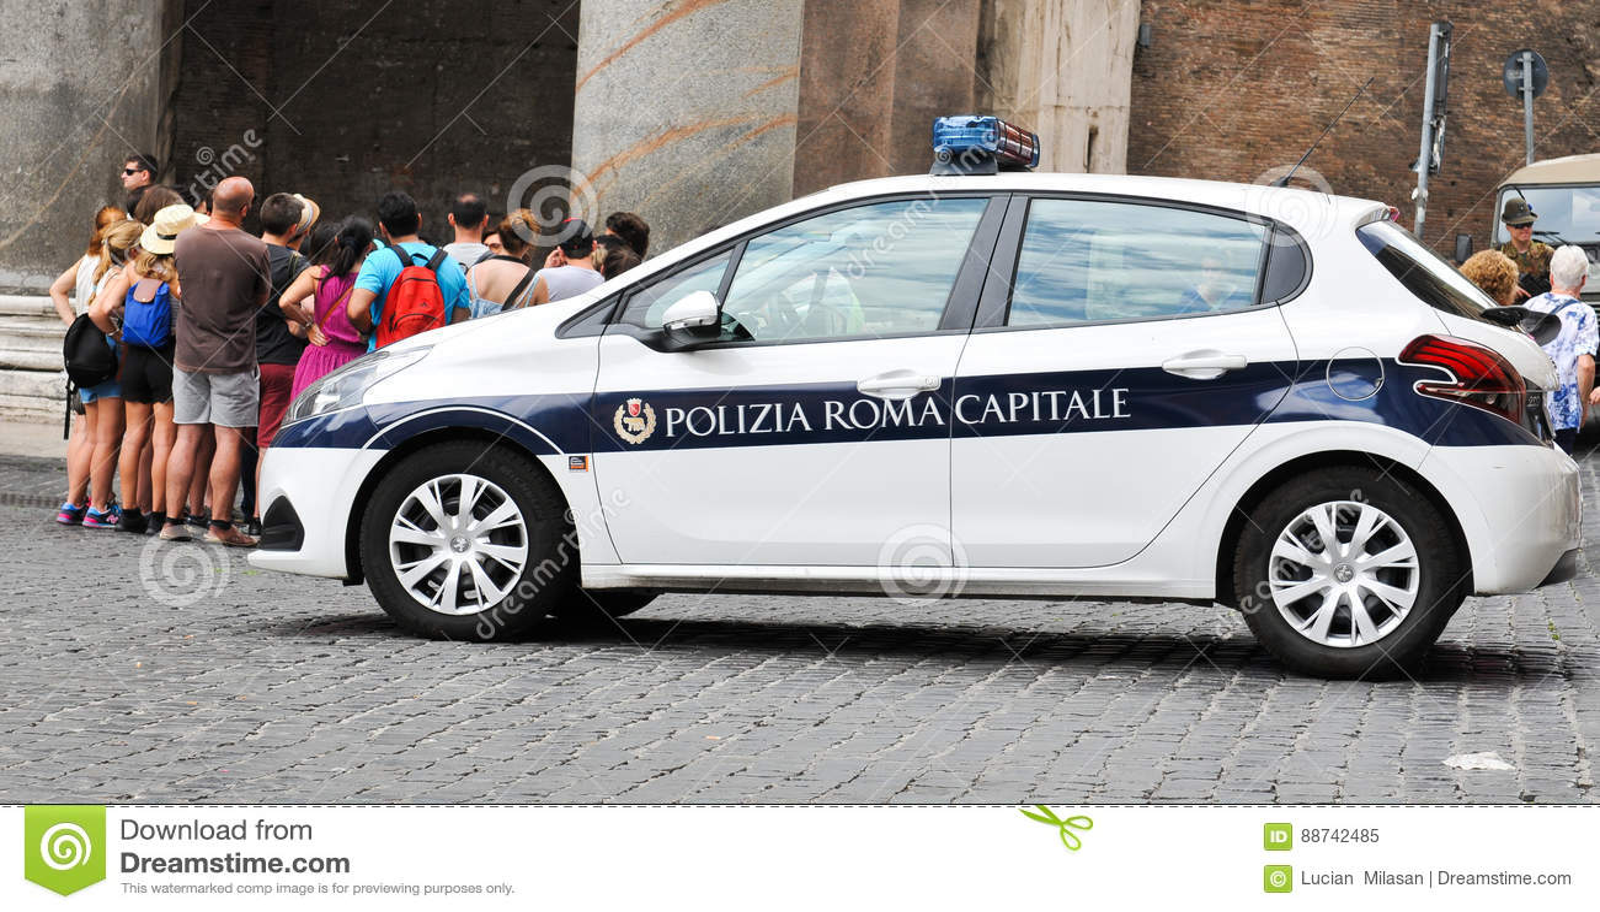 Bilitaly polis rome